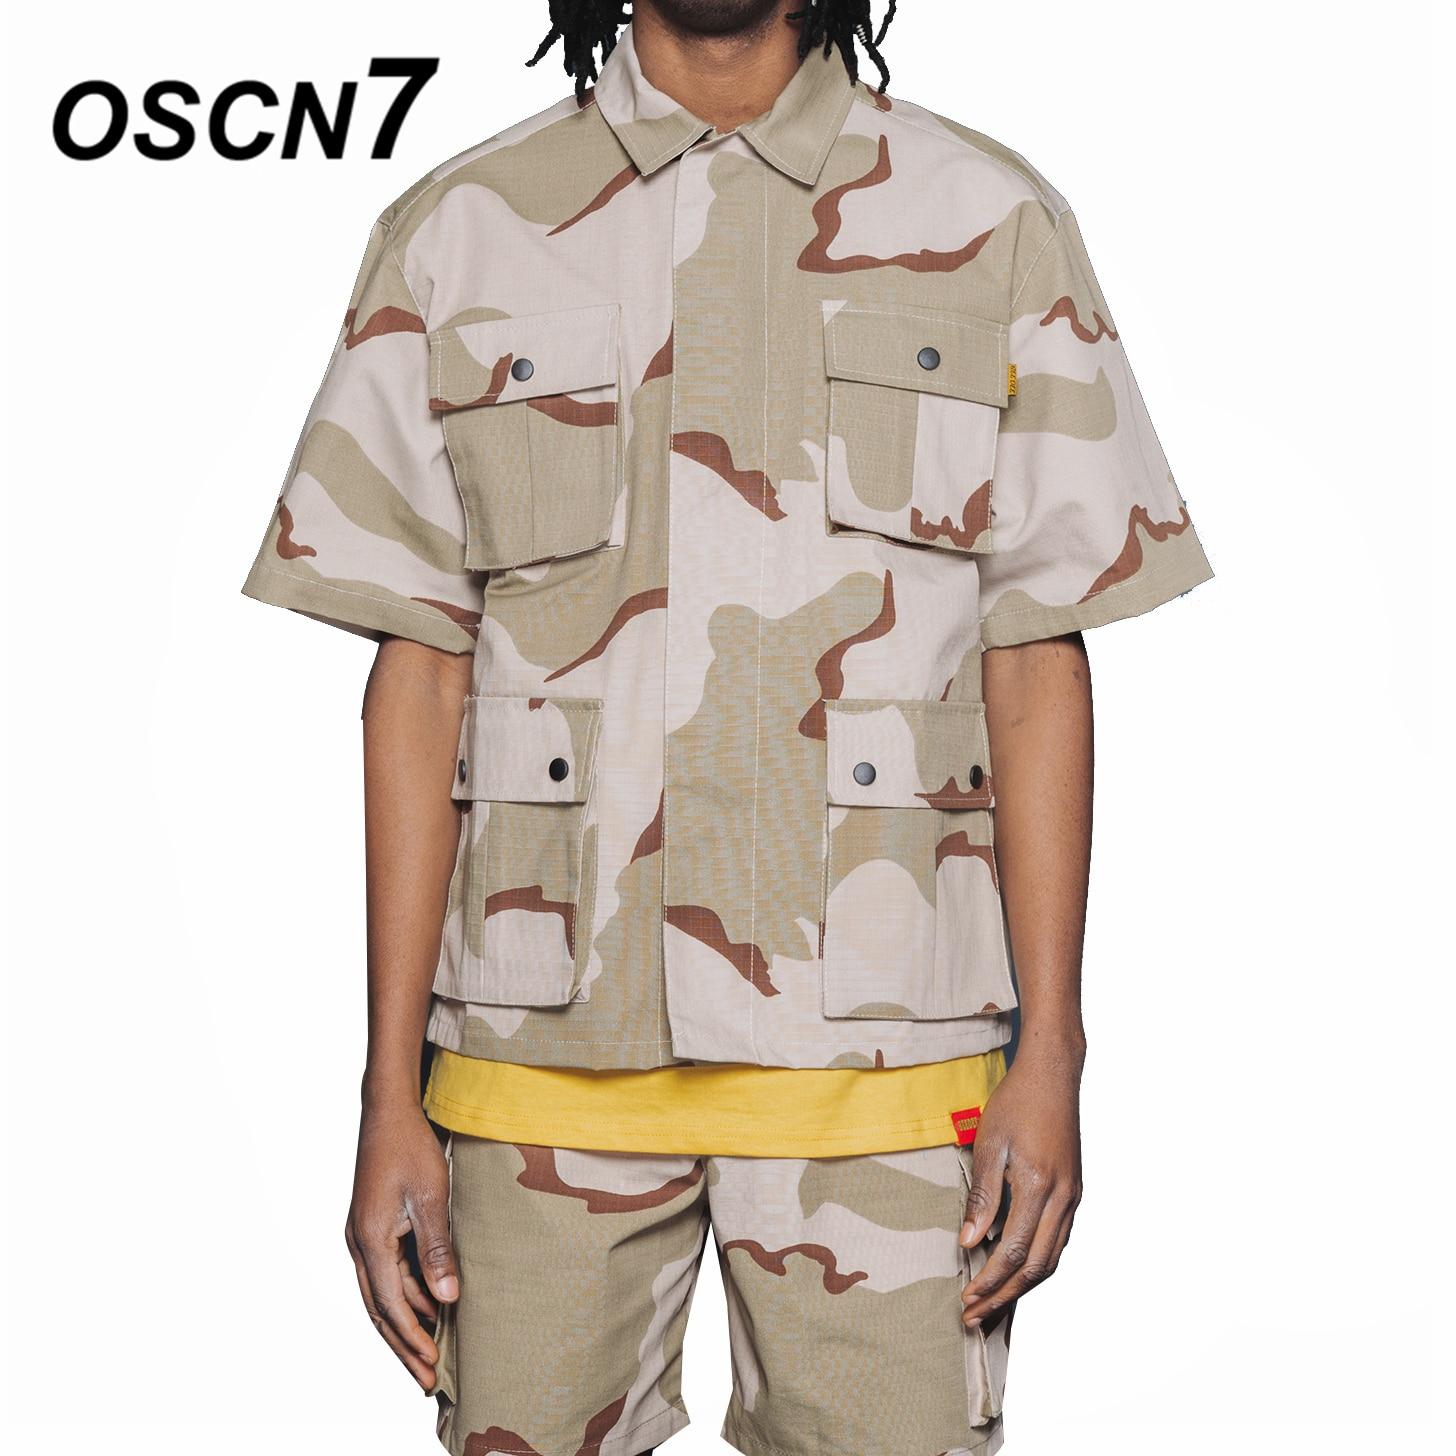 OSCN7 Fashion Short Sleeve Jackets Loose Casual Hip Hop Mens Cargo Jackets Streetwear Jaquetas Masculina 1816